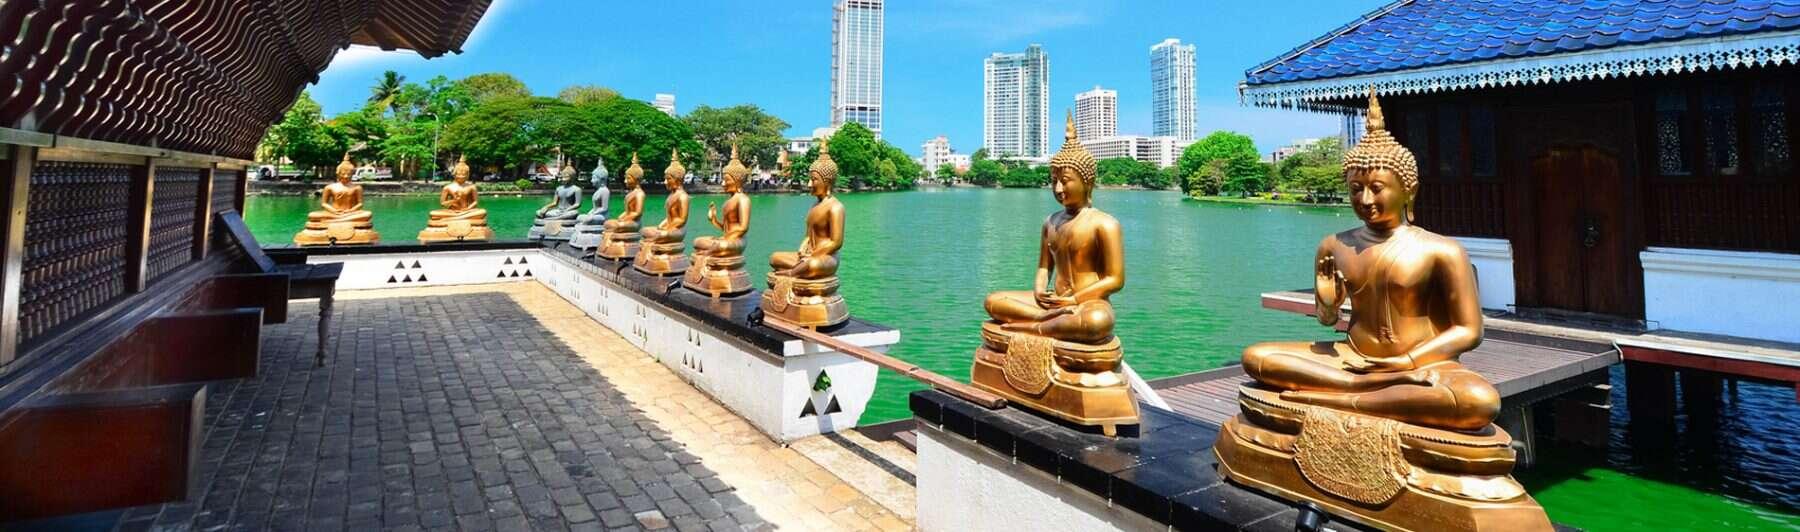 Welcome to Sri Lanka – <b>Postponed to Fall 2021</b>